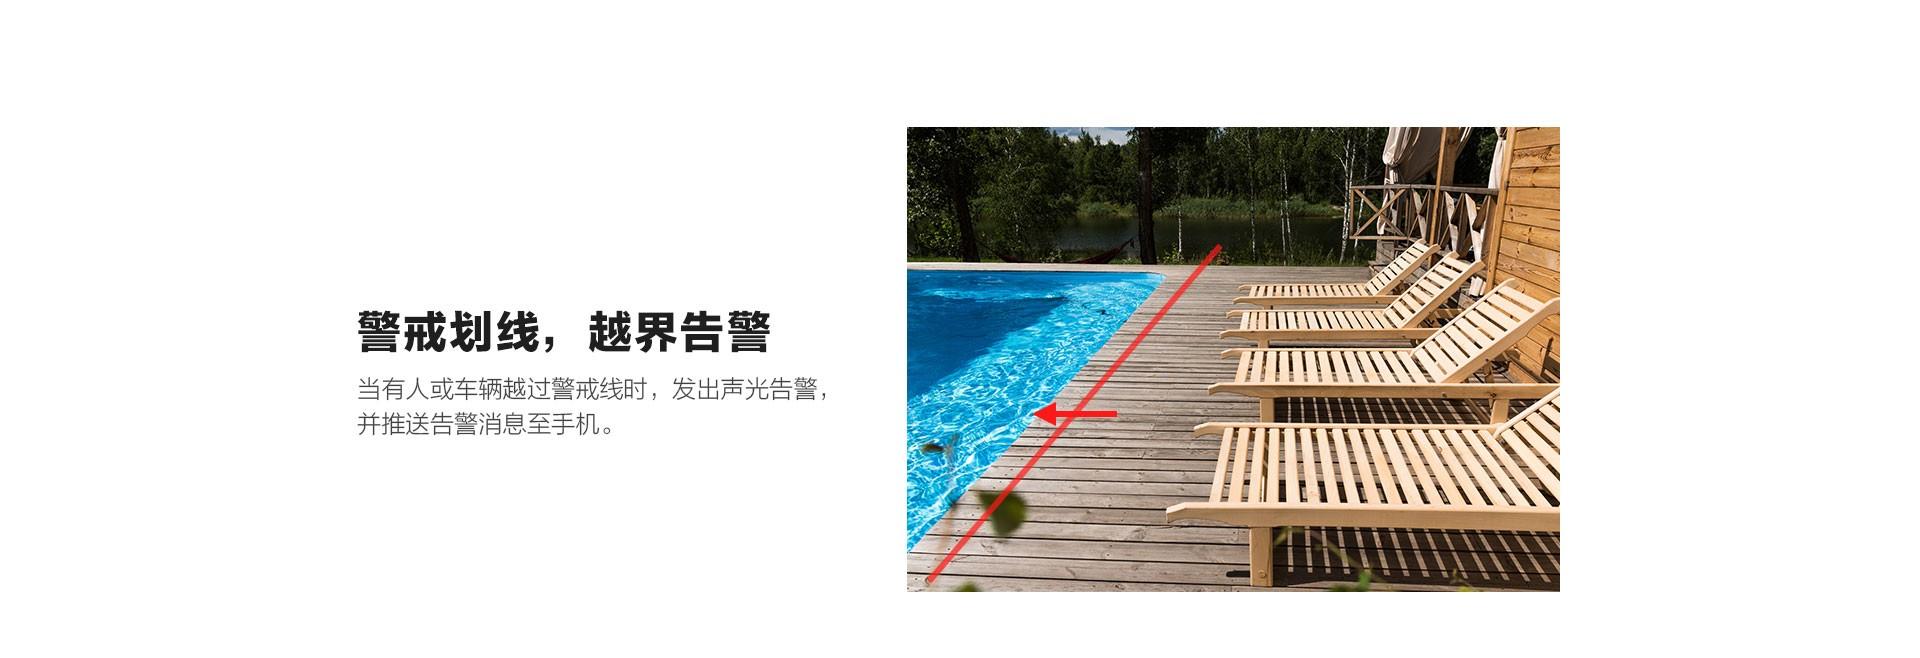 C3X-poe-web_11.jpg